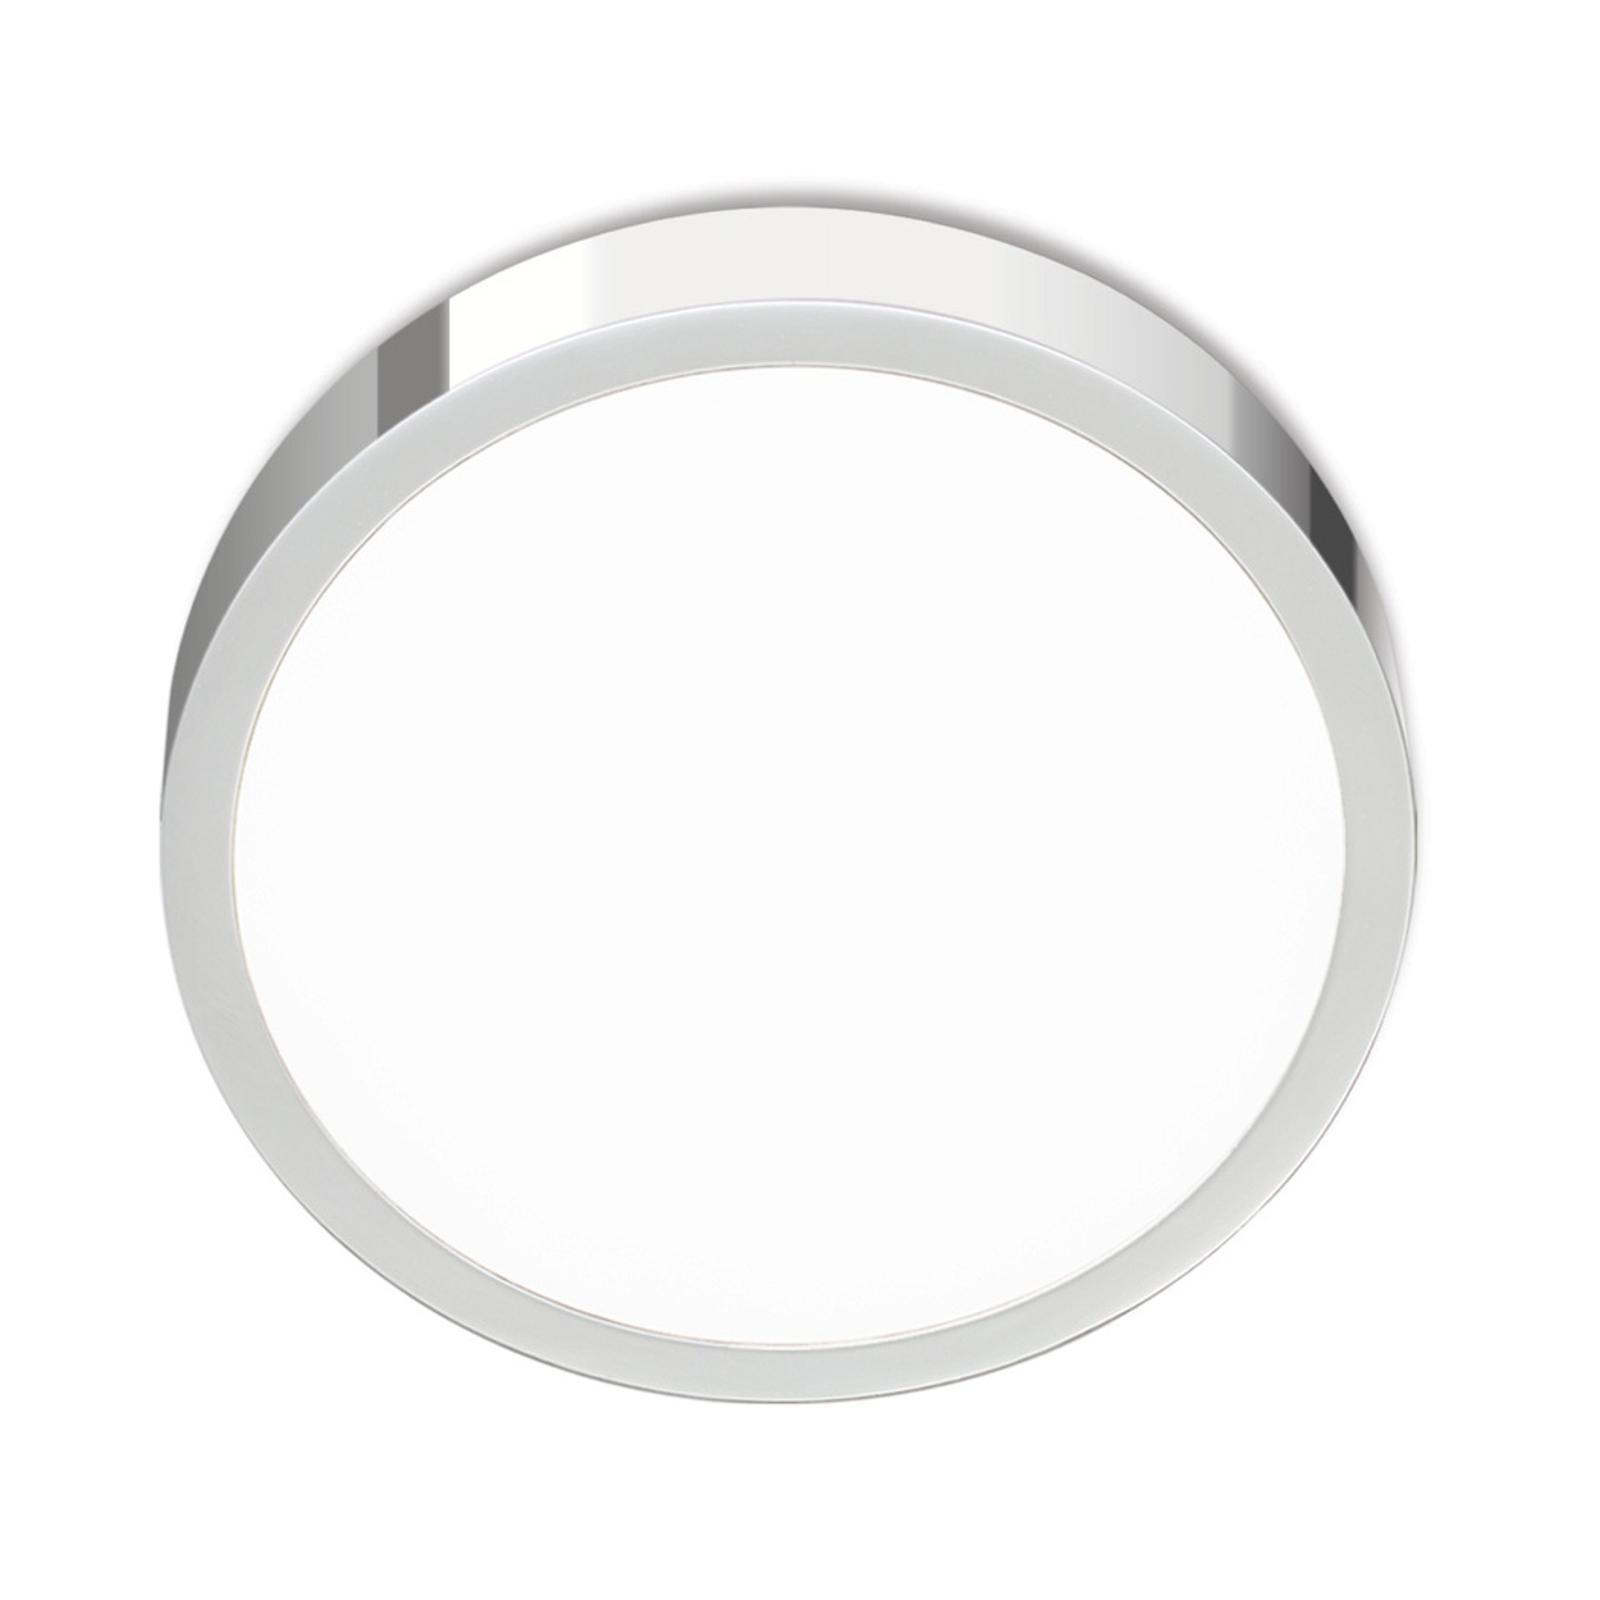 LED-kattovalaisin Bully, kromia, 14 cm